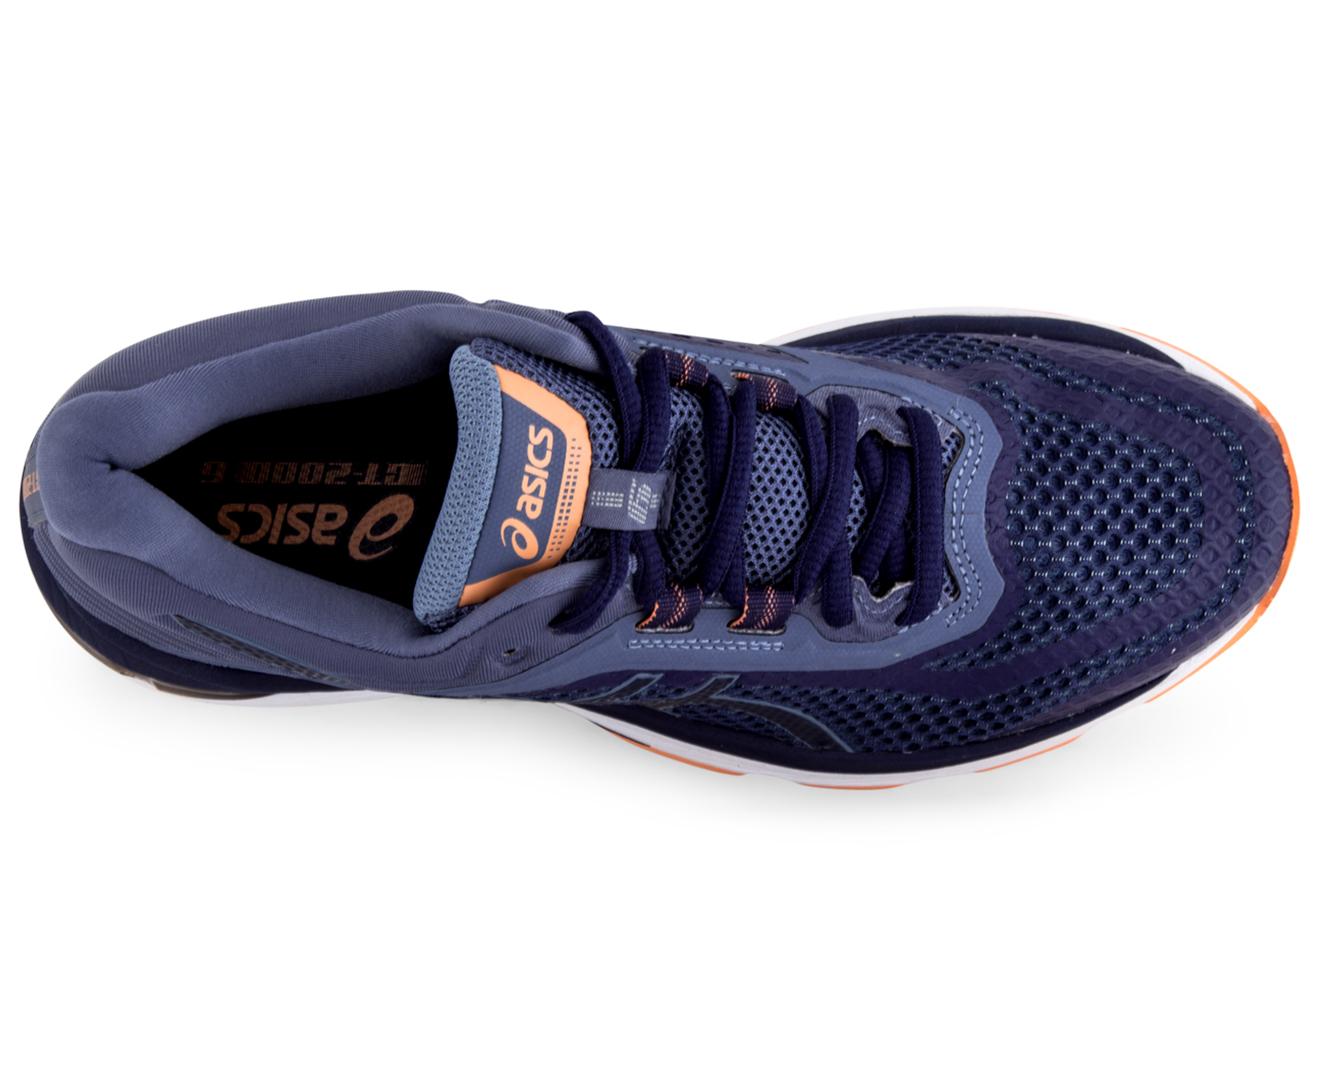 814c8ace65c0 ASICS Women s GT-2000 6 Shoe - Indigo Blue Indigo Blue Smoke Blue ...